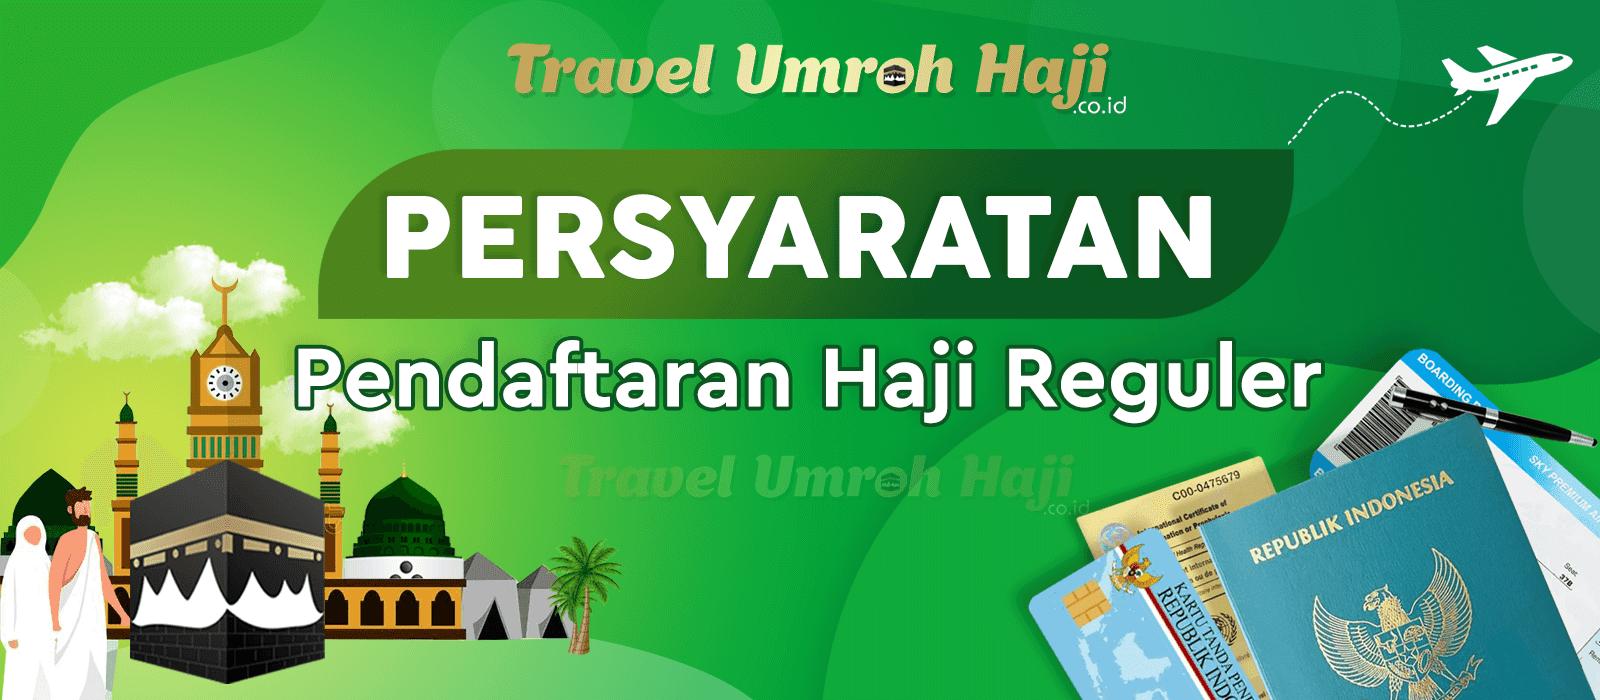 Persyaratan dan Tata Cara Pendaftaran Haji Reguler